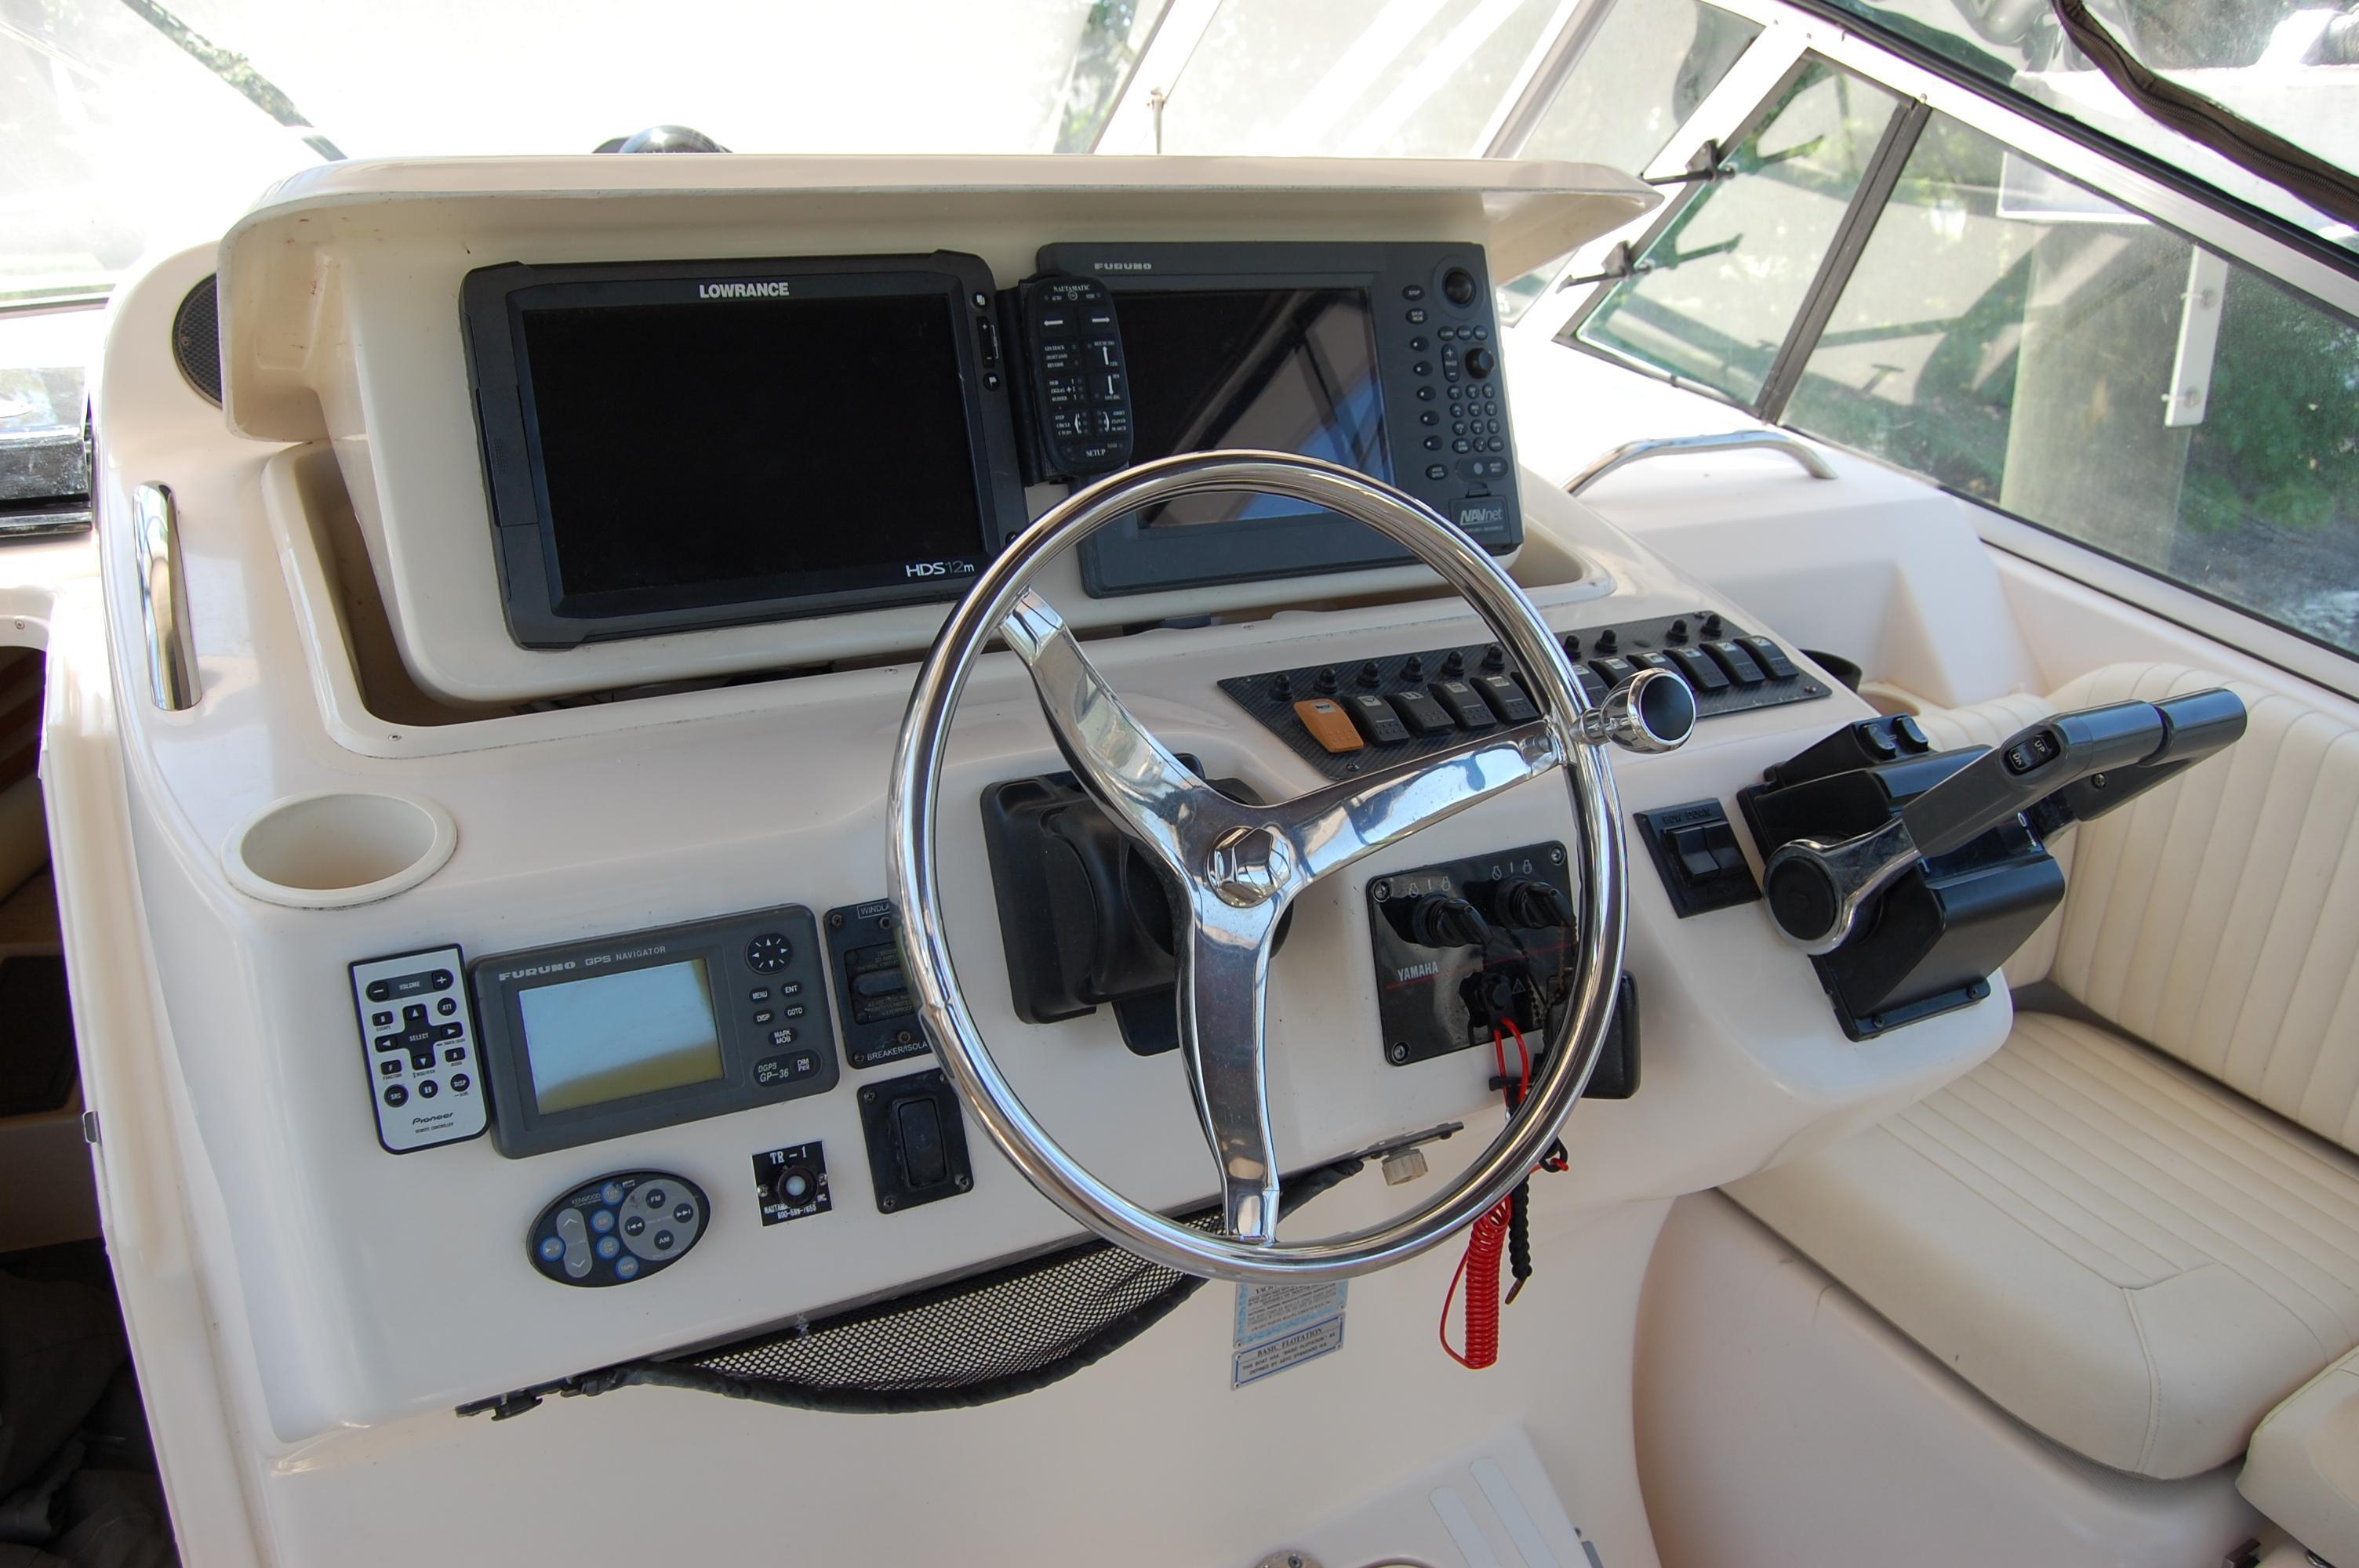 2002 Grady White 330 Express, dash raises electrically